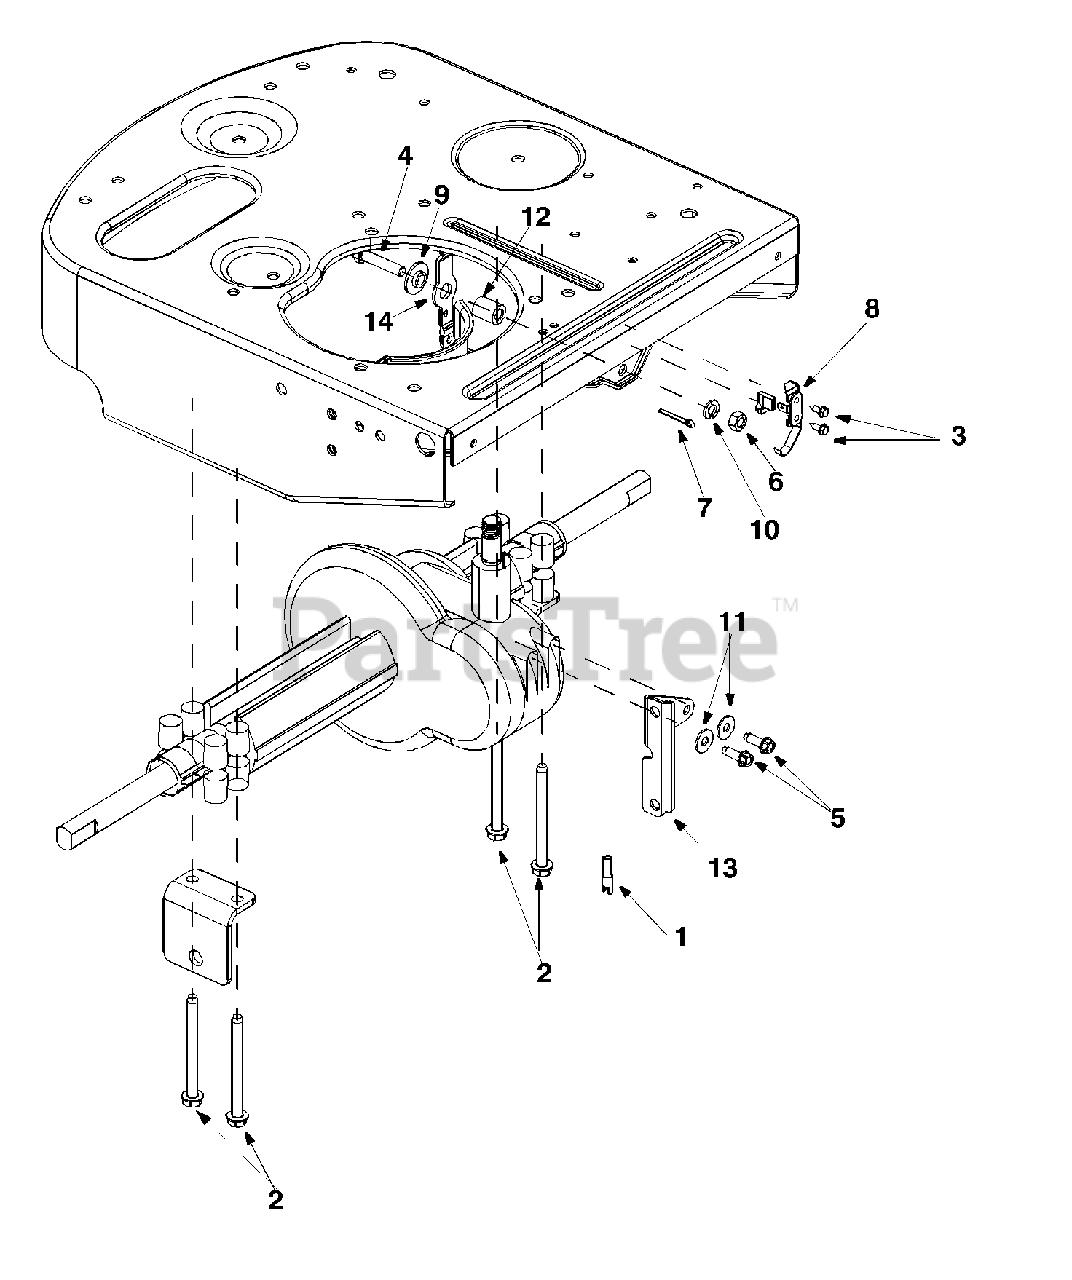 Craftsman 247 13a 328 099